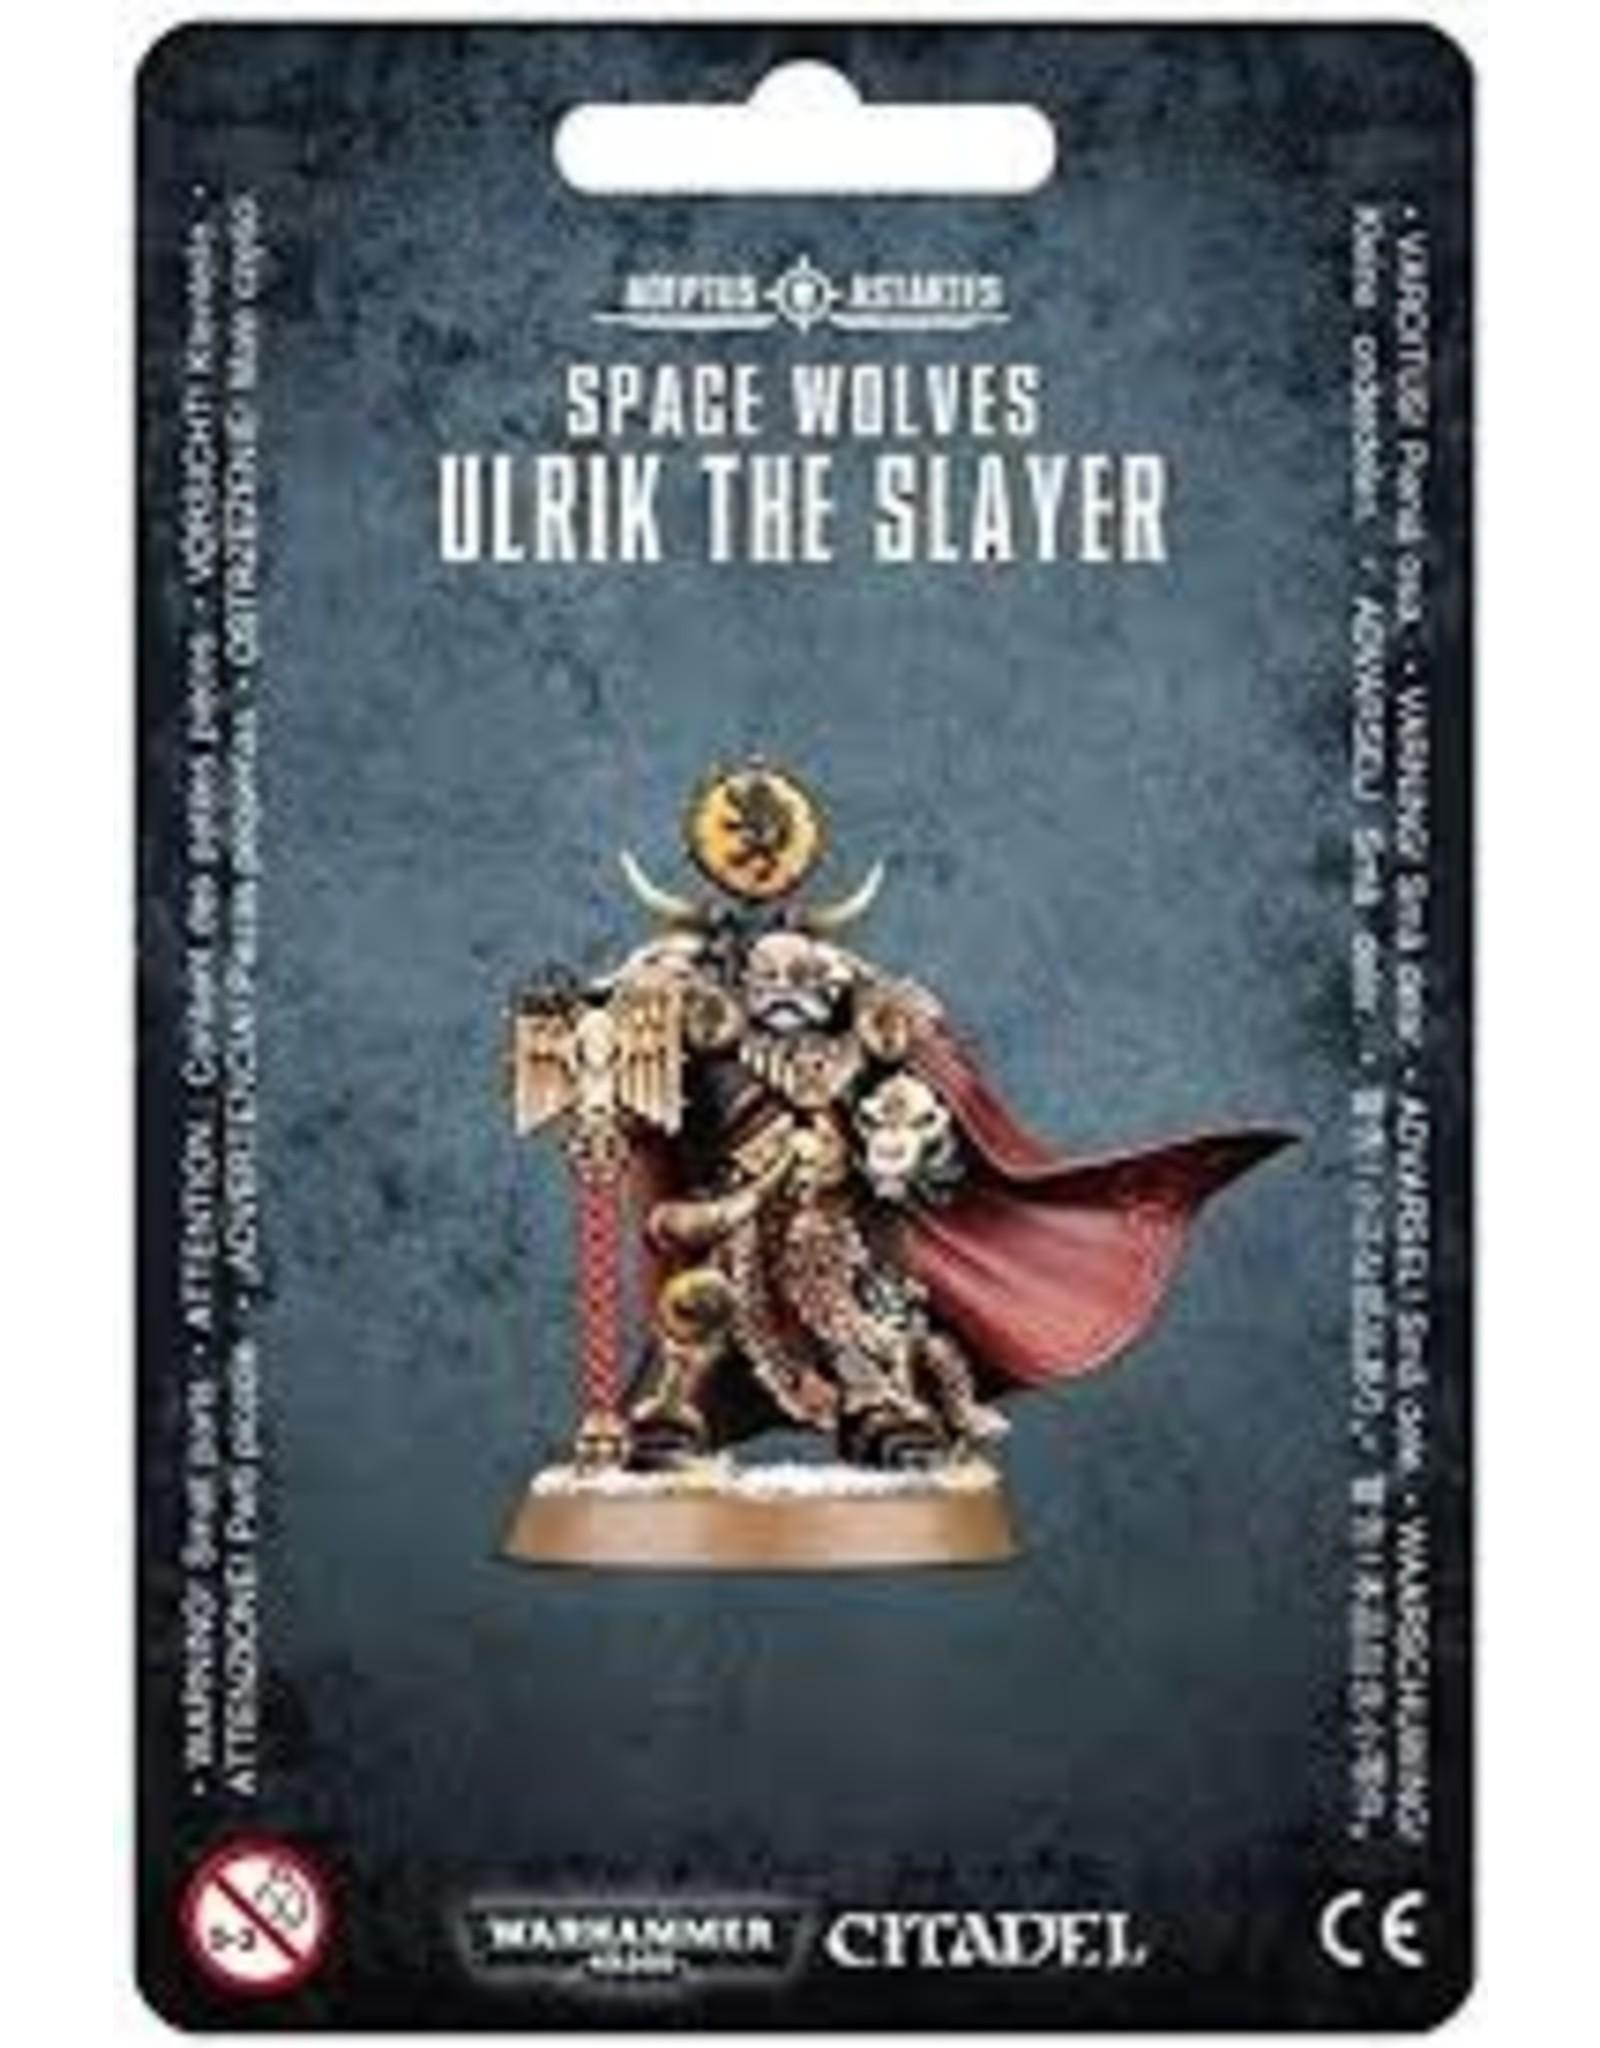 Warhammer 40K Space Wolves Ulrik the Slayer